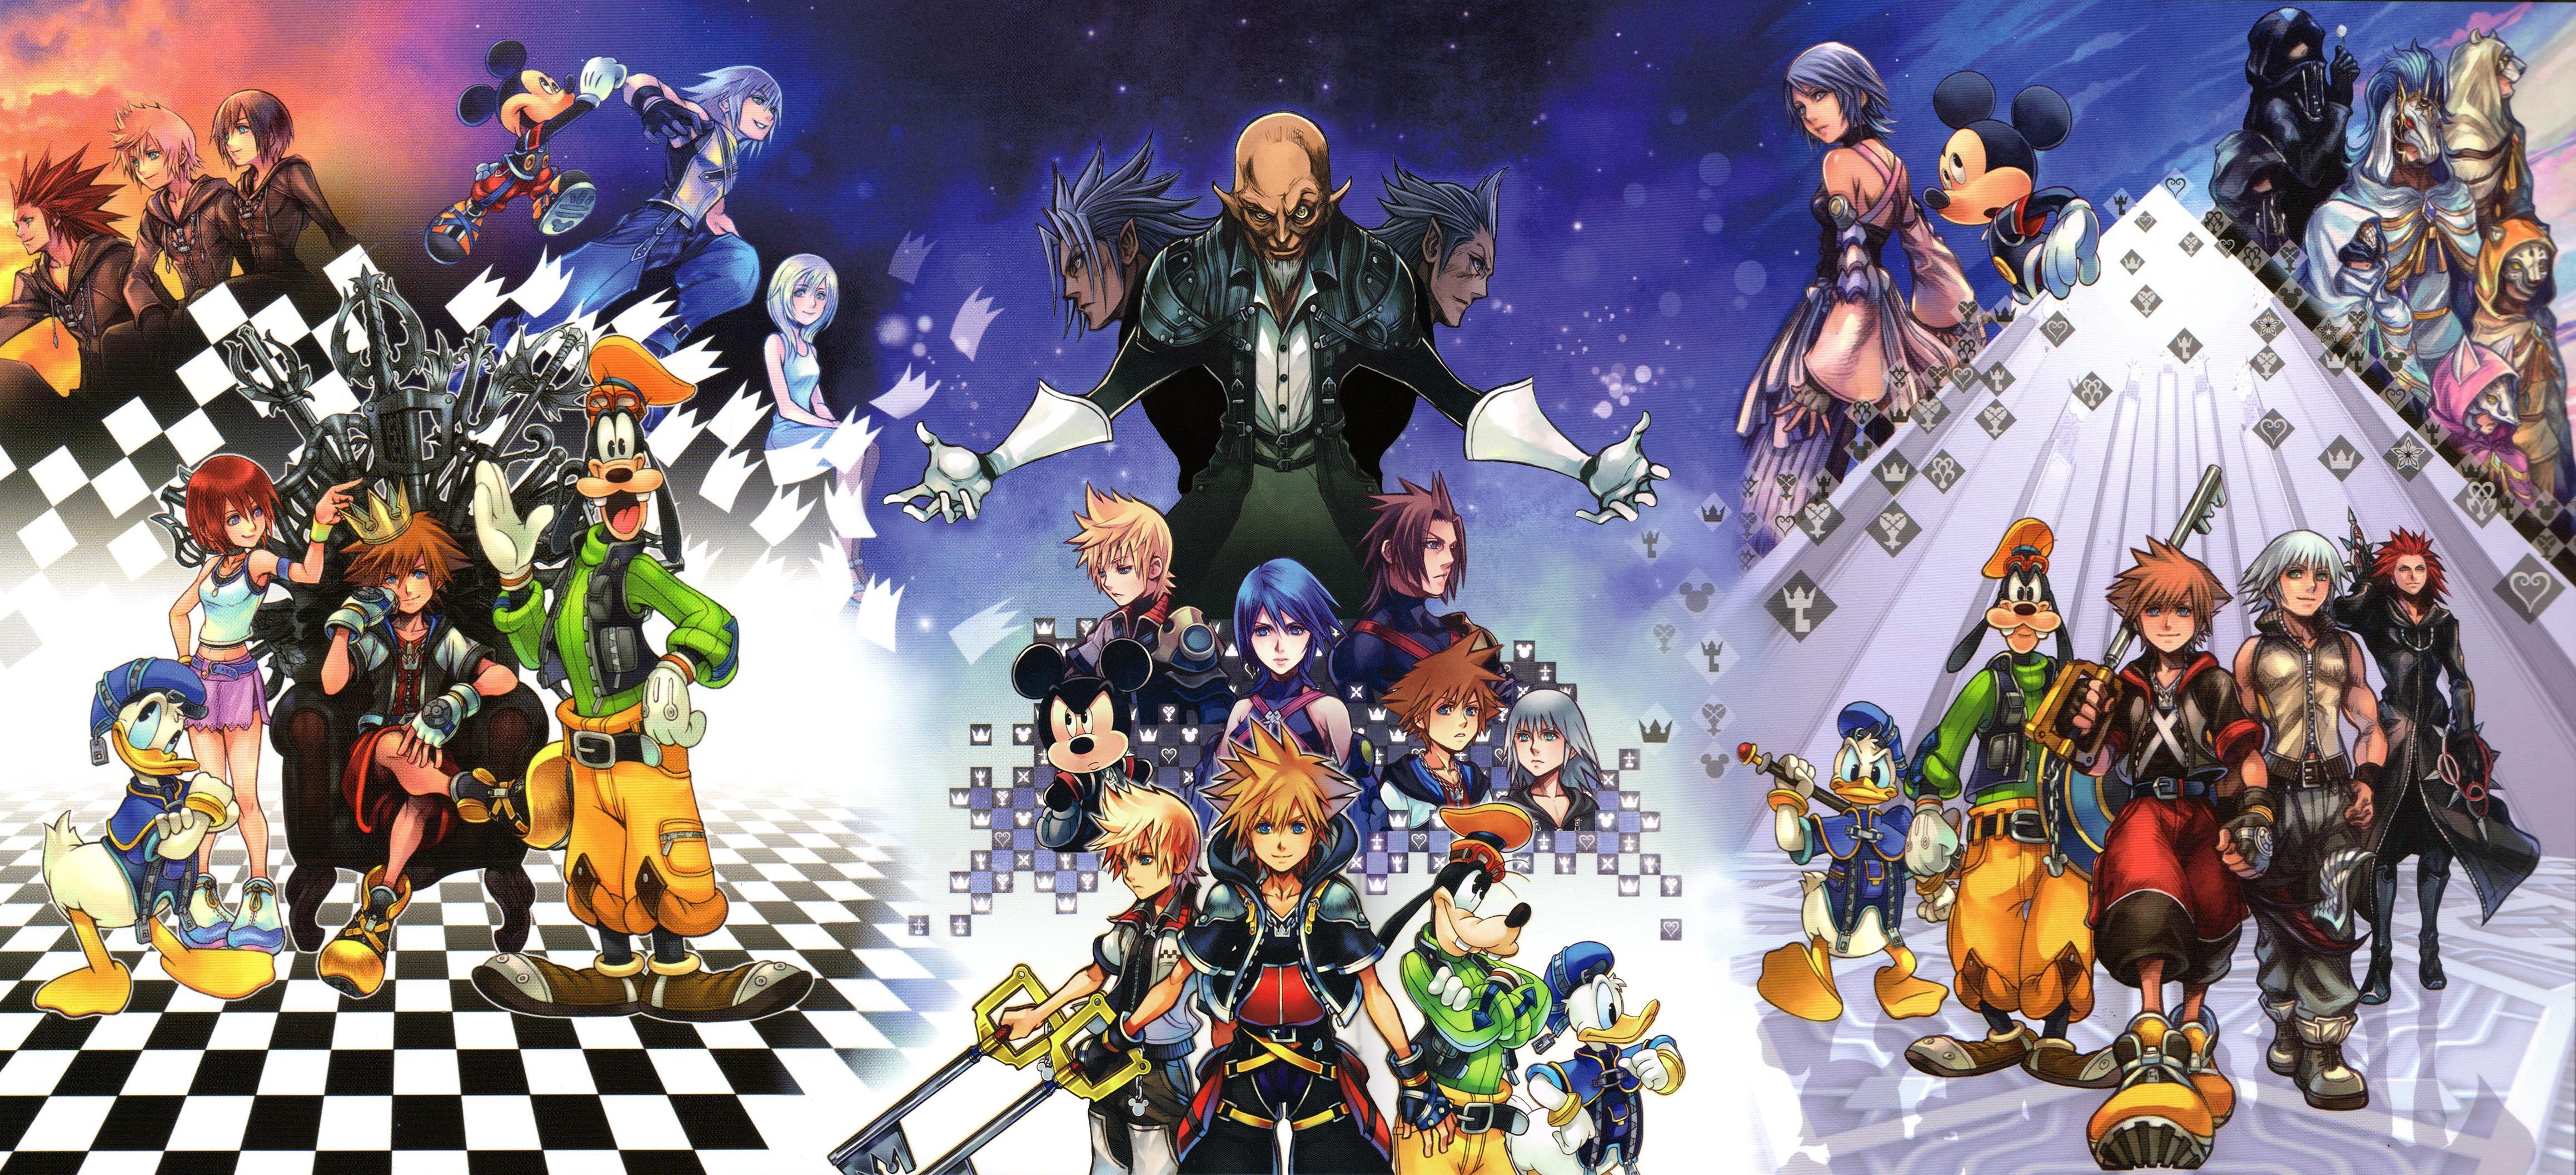 hd kingdom hearts wallpaper